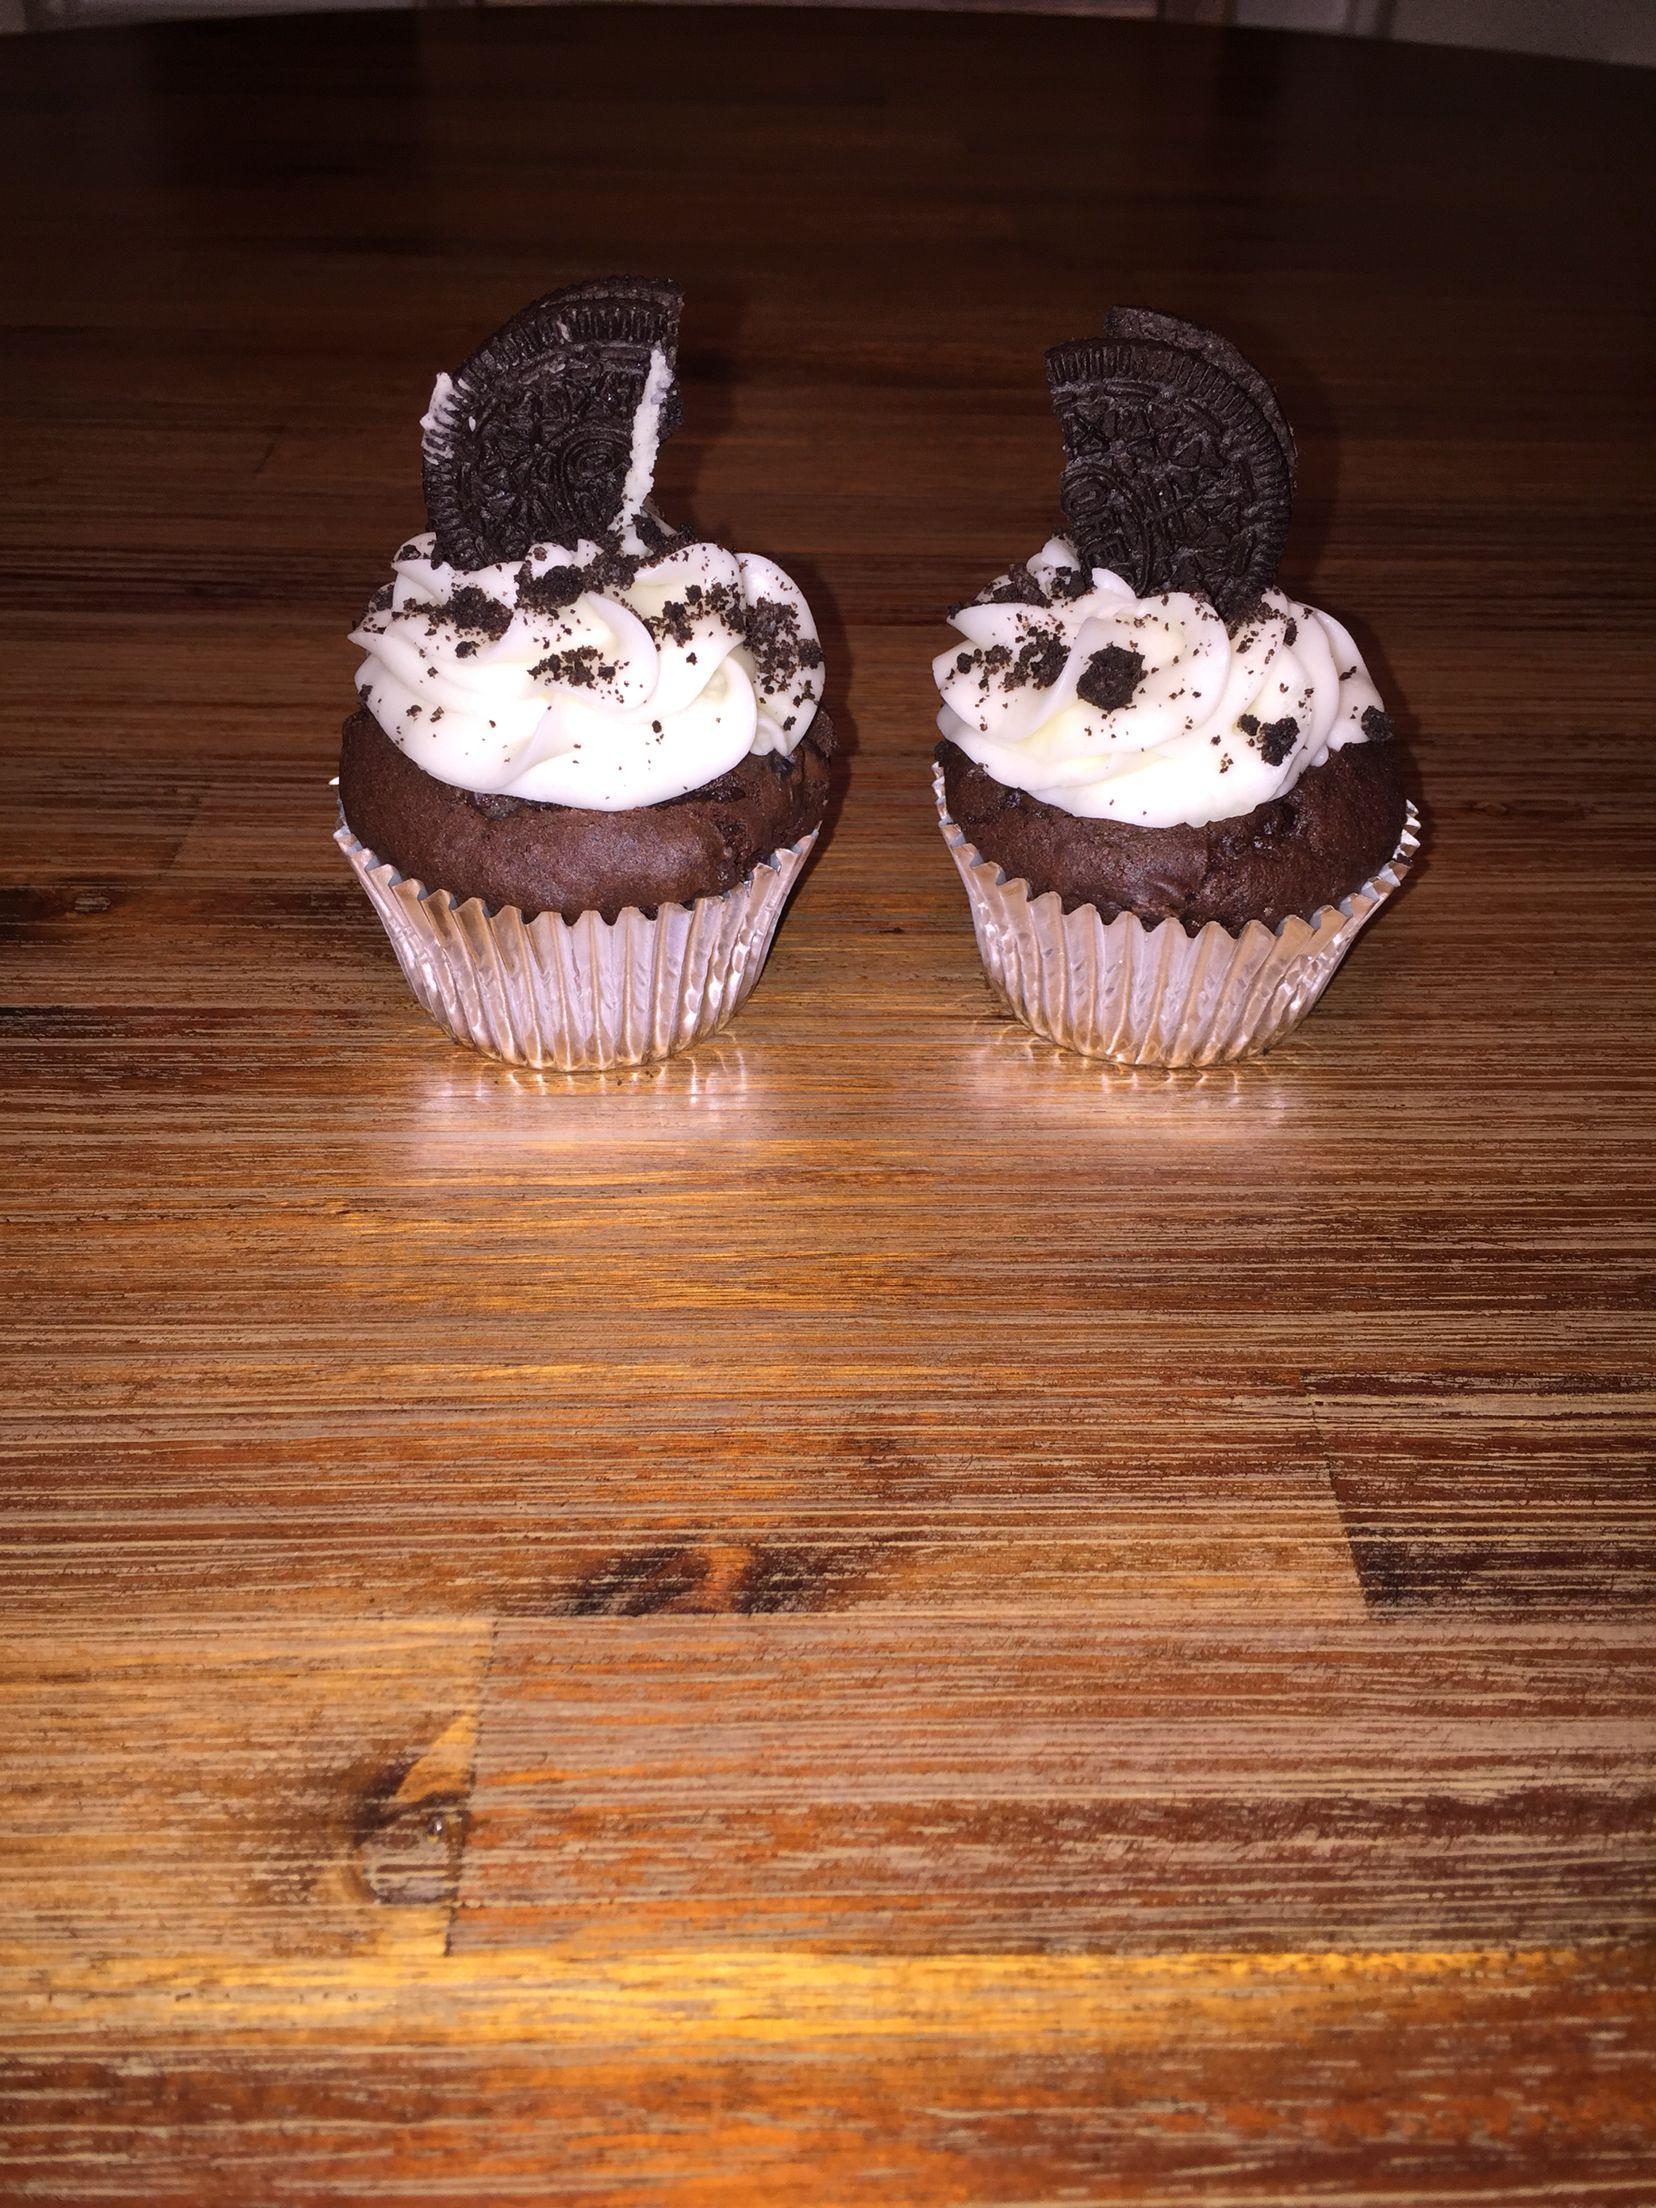 Oreo double chocolate cupcakes I made! Desserts, Oreo